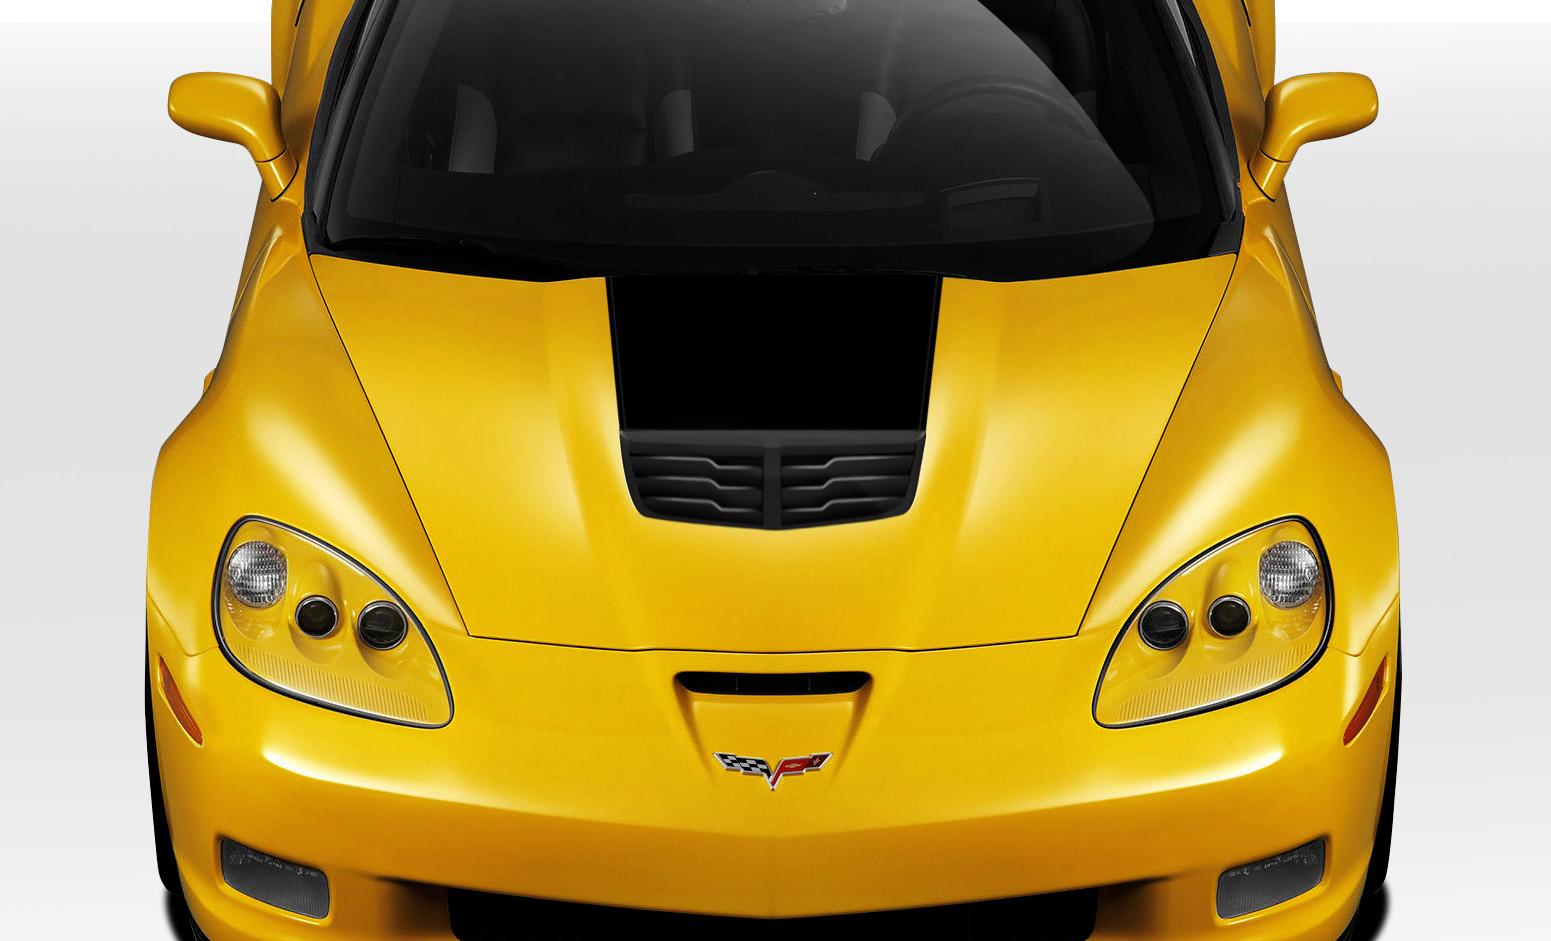 Chevrolet Corvette Zr furthermore Zr Double Overhead Cam Four Valve Lt Engine Img A furthermore Ea B Beb Ffa moreover Zr Double Overhead Cam Four Valve Lt Engine Dsc A as well . on 1972 corvette zr1